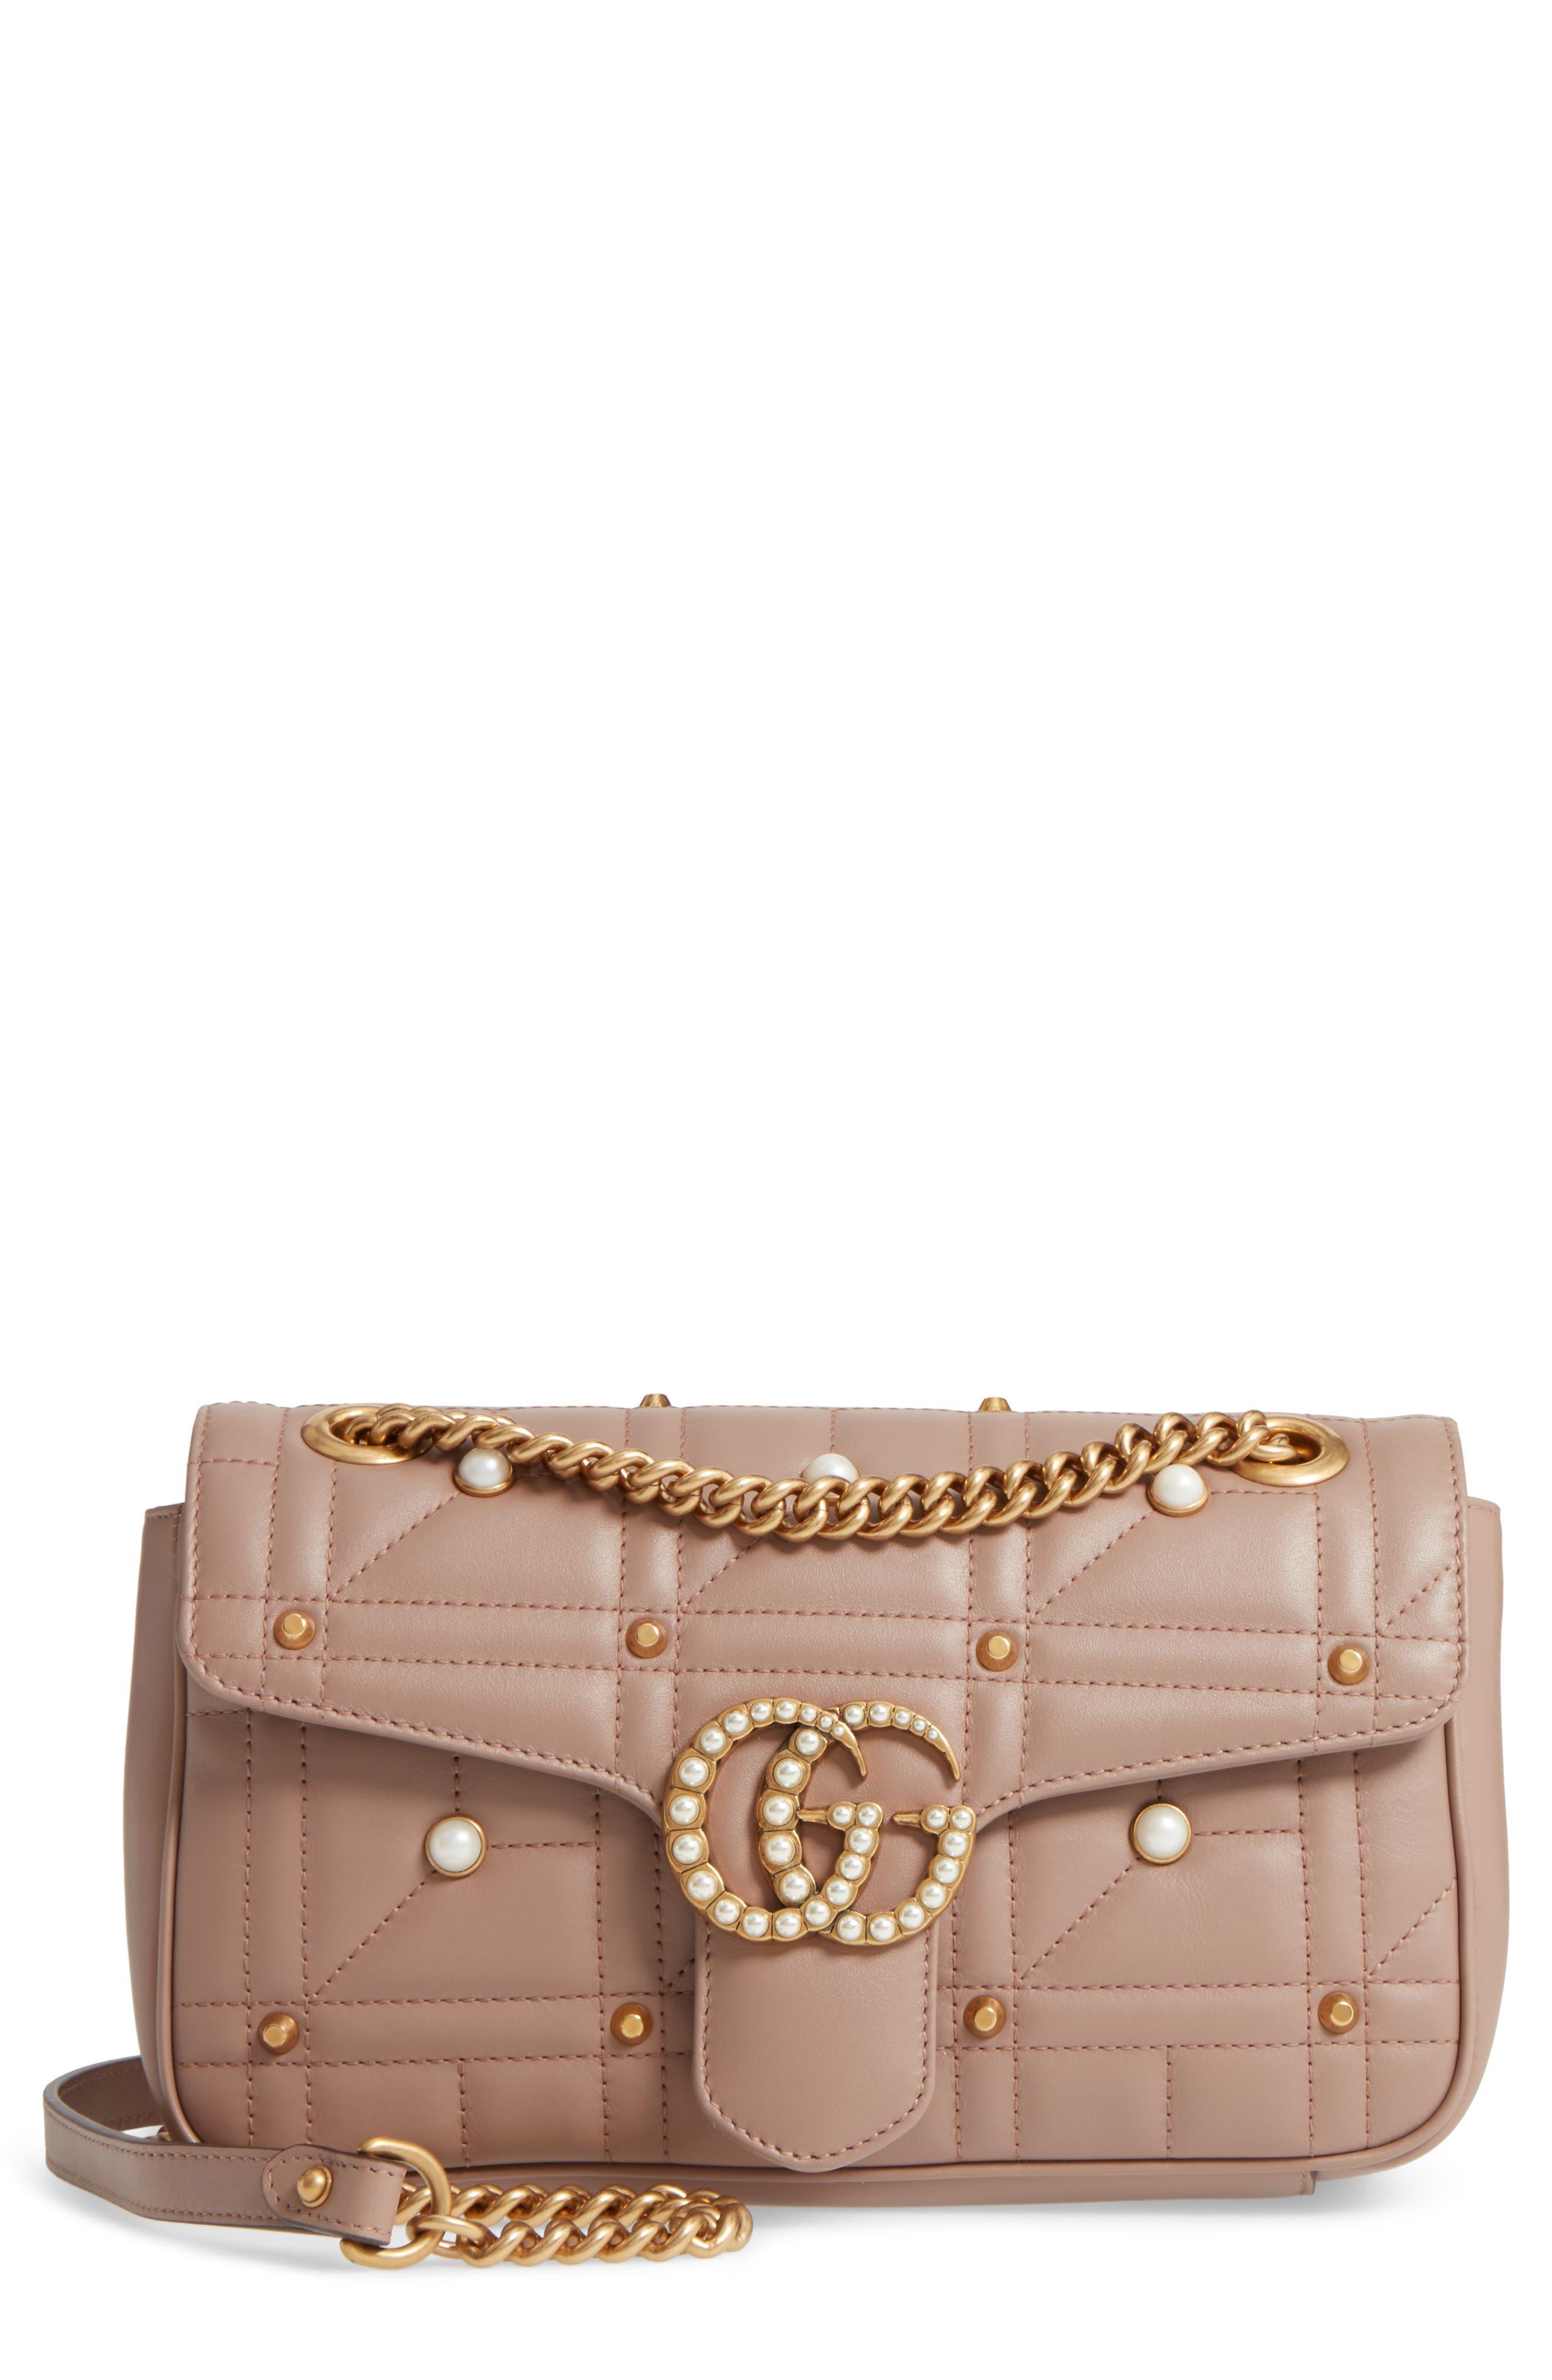 GG Marmont Matelassé Imitation Pearl Leather Shoulder Bag,                             Main thumbnail 1, color,                             White/ Pink